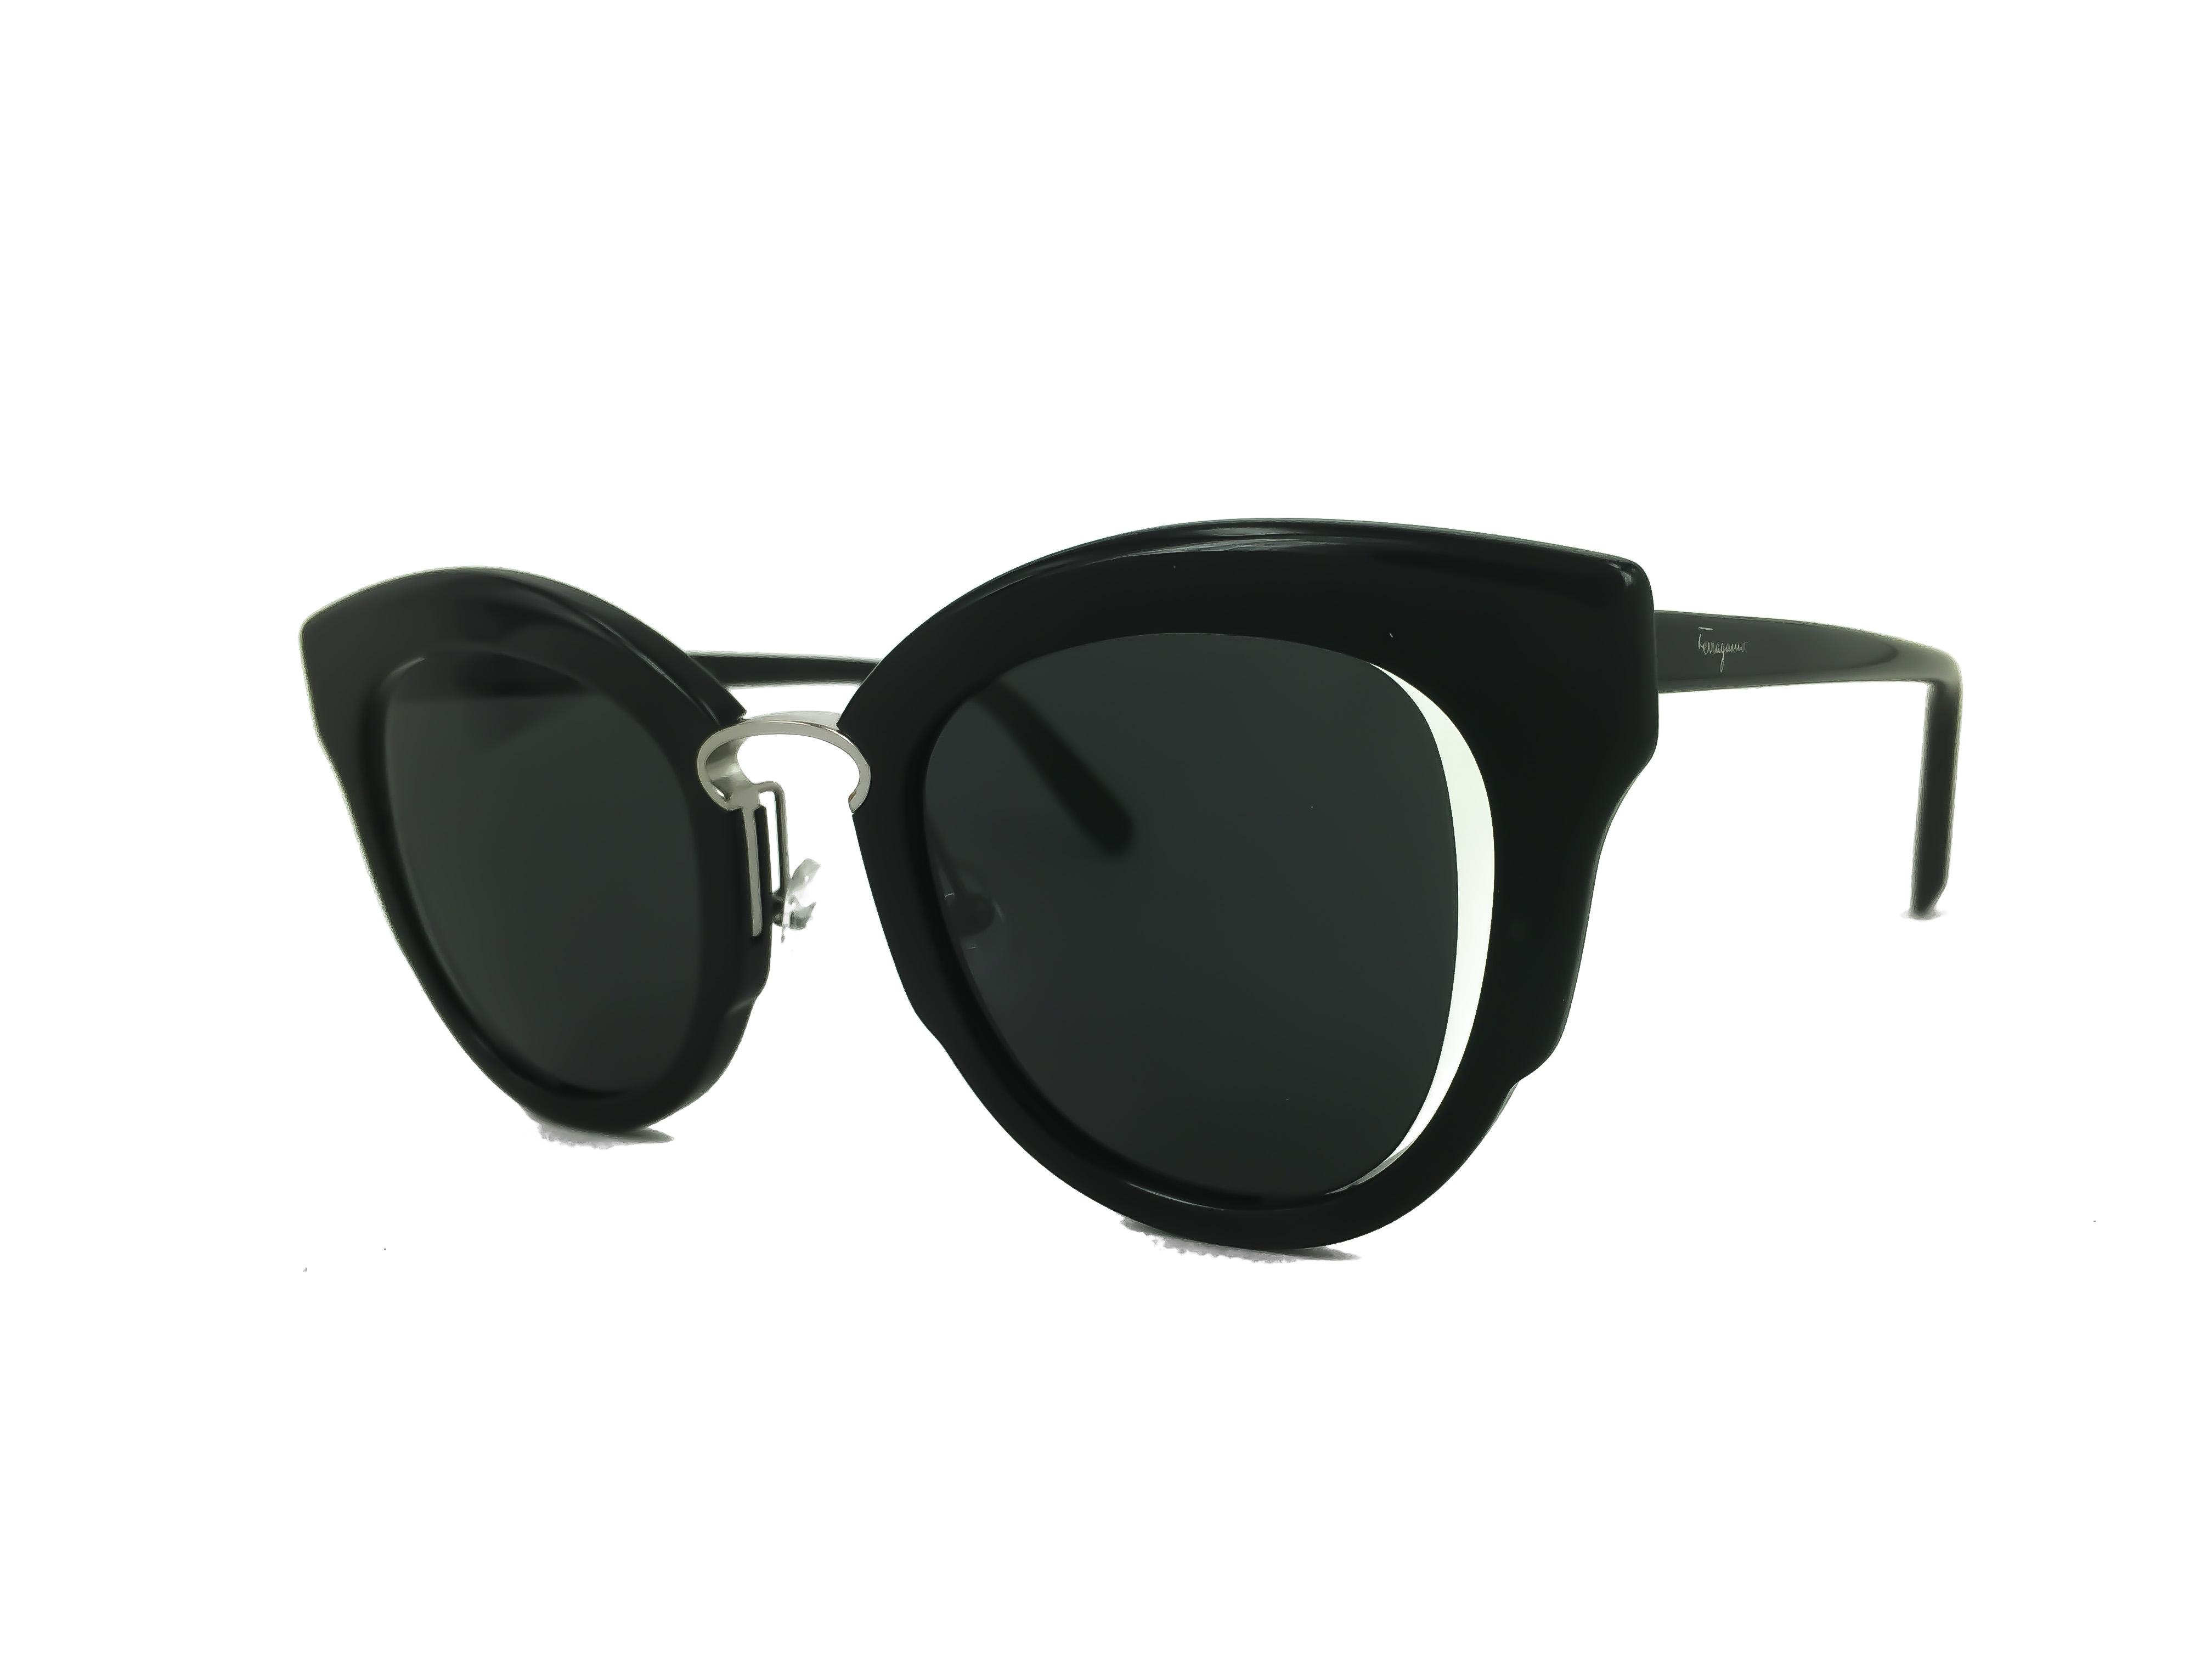 30ff2a6aa4 Τα γυαλιά ηλίου SALVATORE FERRAGAMO SF 830S 001 48 ταιριάζουν ιδανικά σε  μεσαία και μεγάλα πρόσωπα και χαρίζουν μοναδικό στυλ.